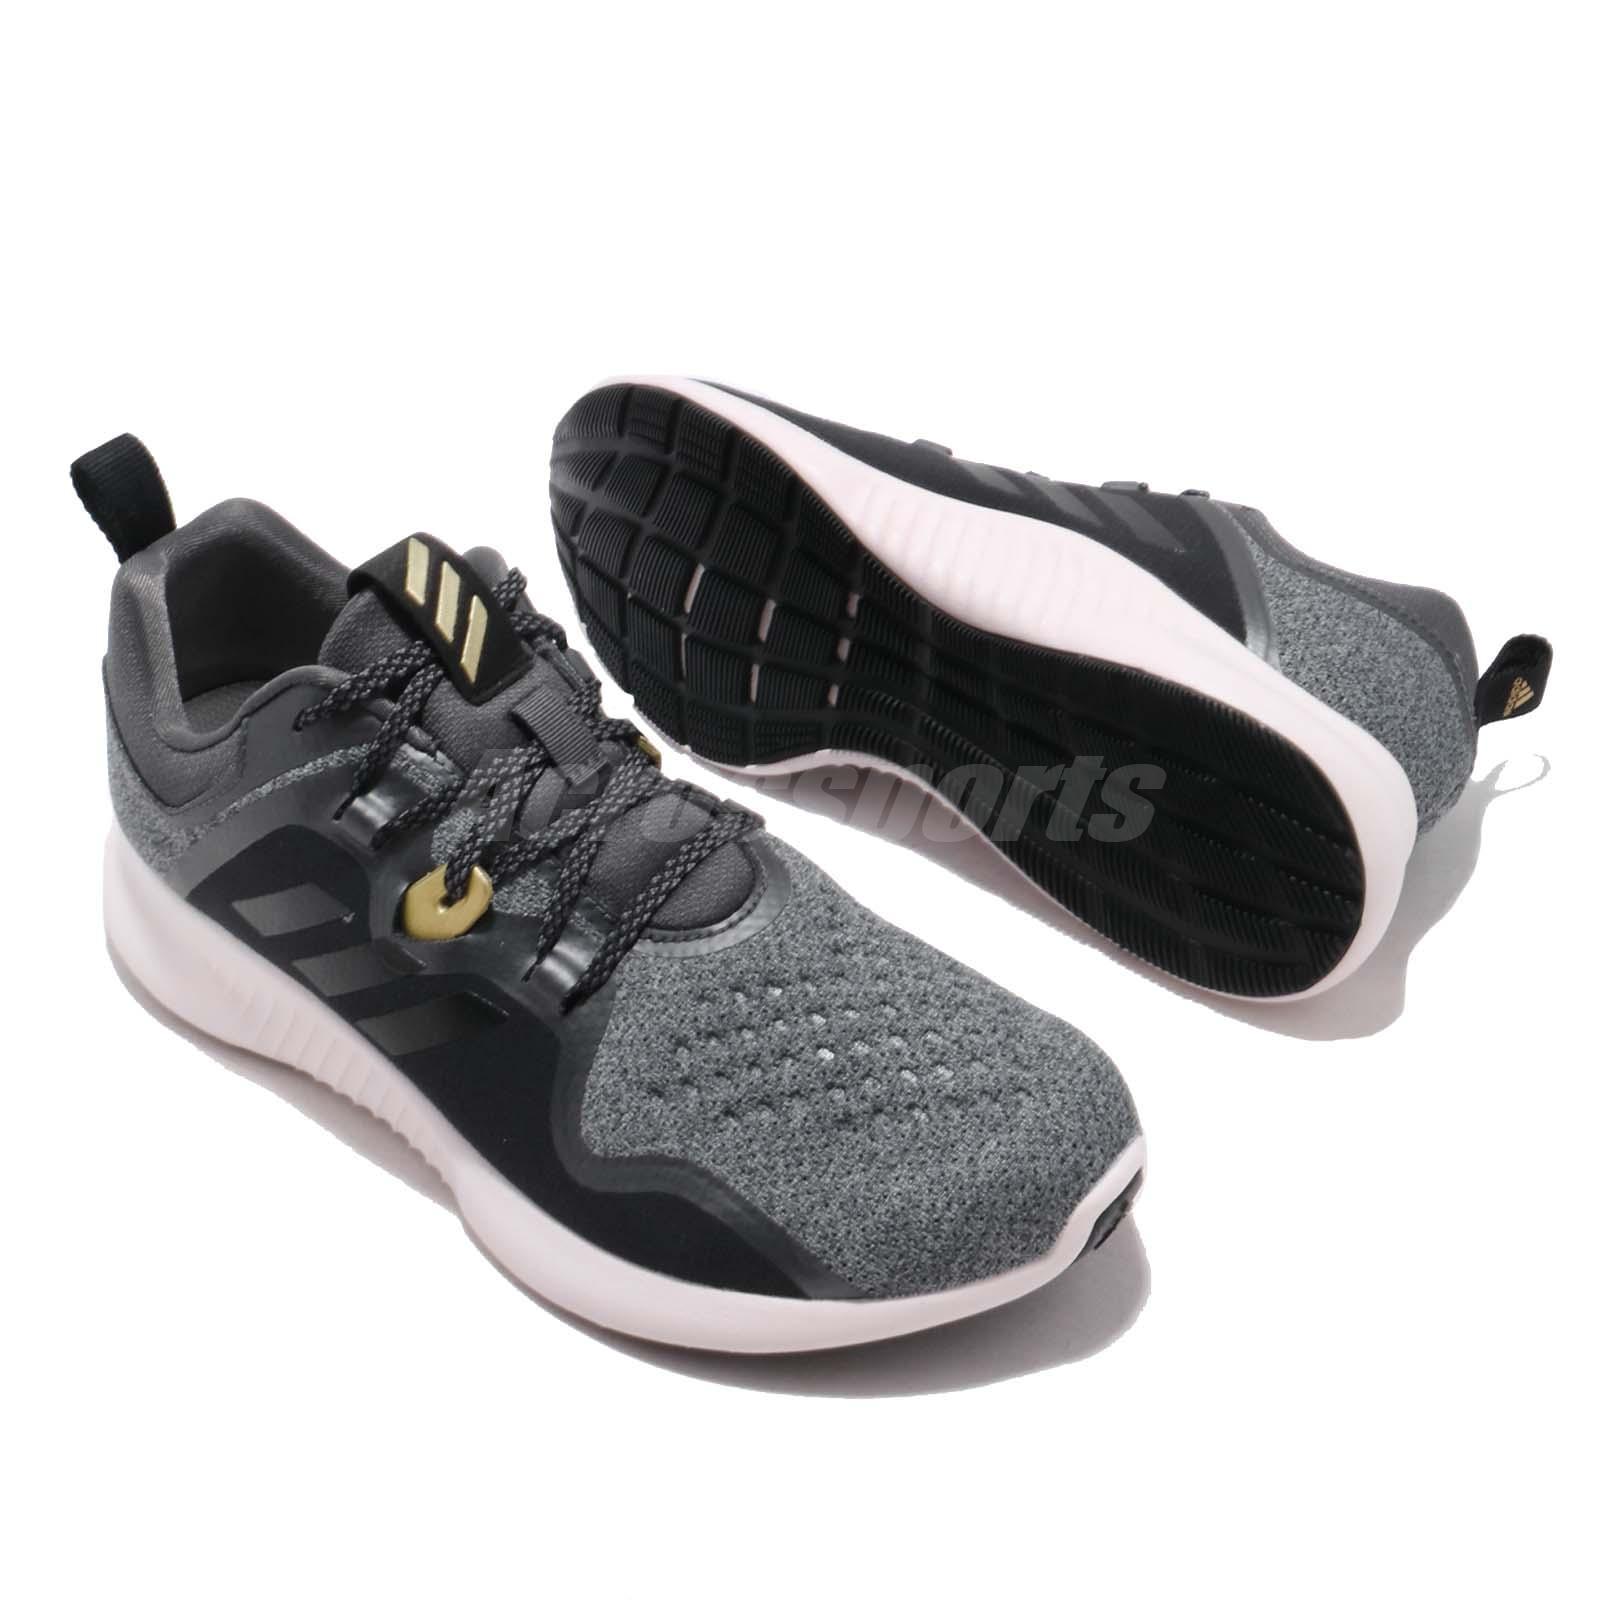 adidas Edgebounce W Black Grey Orchid Tint Women Running Shoes ... 582e0433d